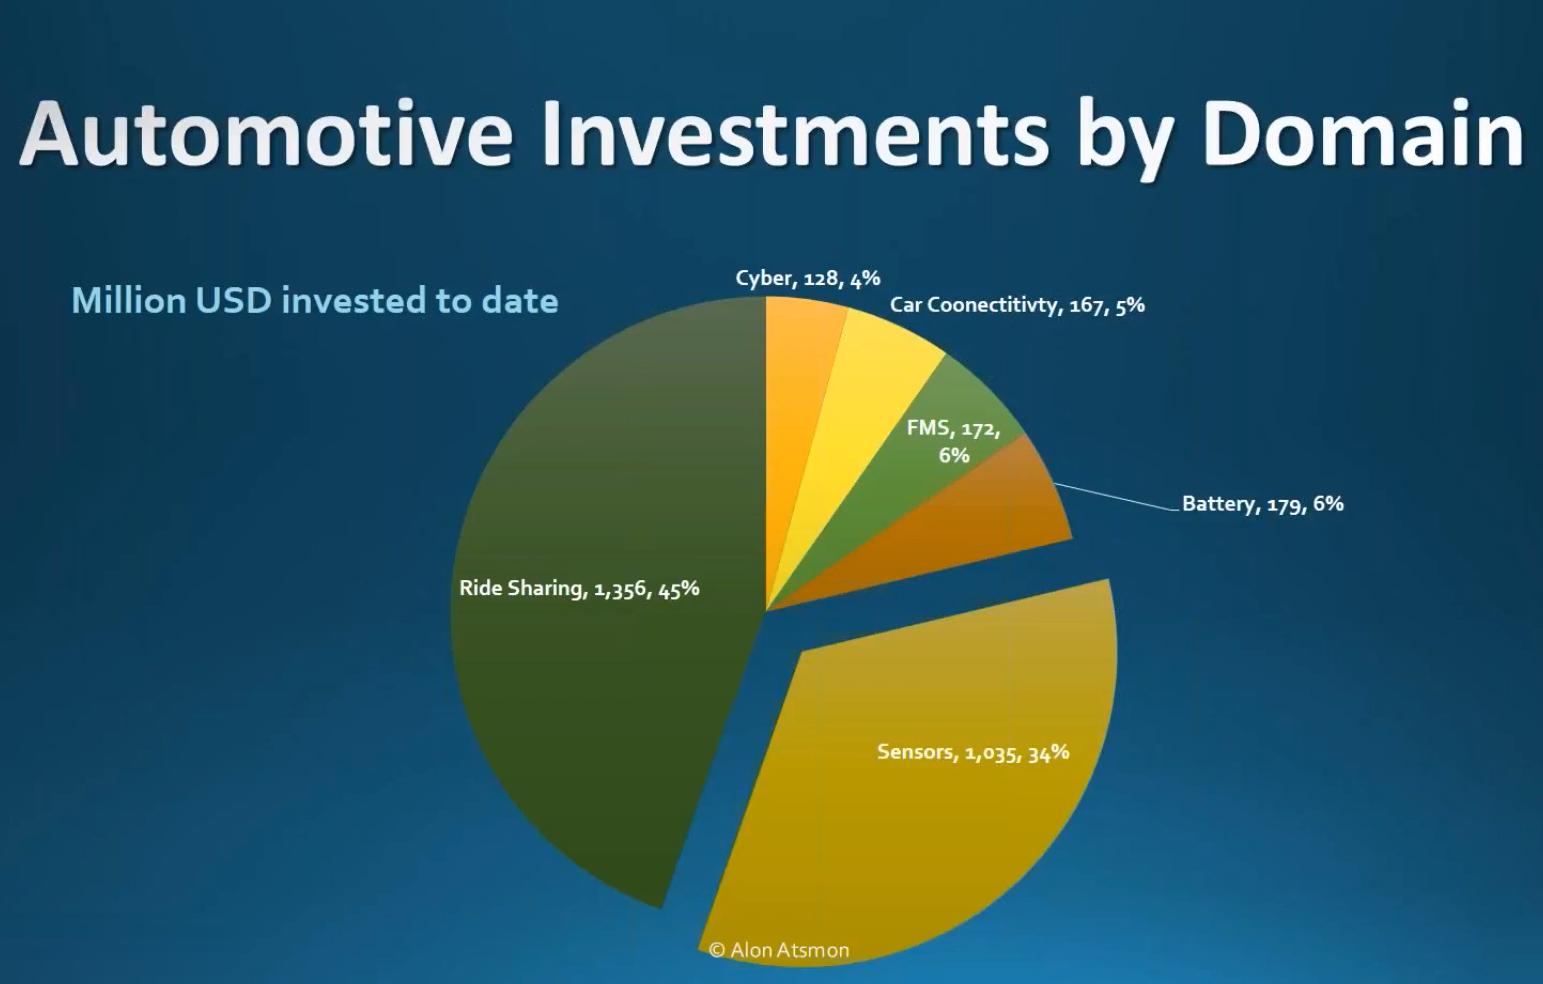 Alopn Atsmon - auto investments by domain